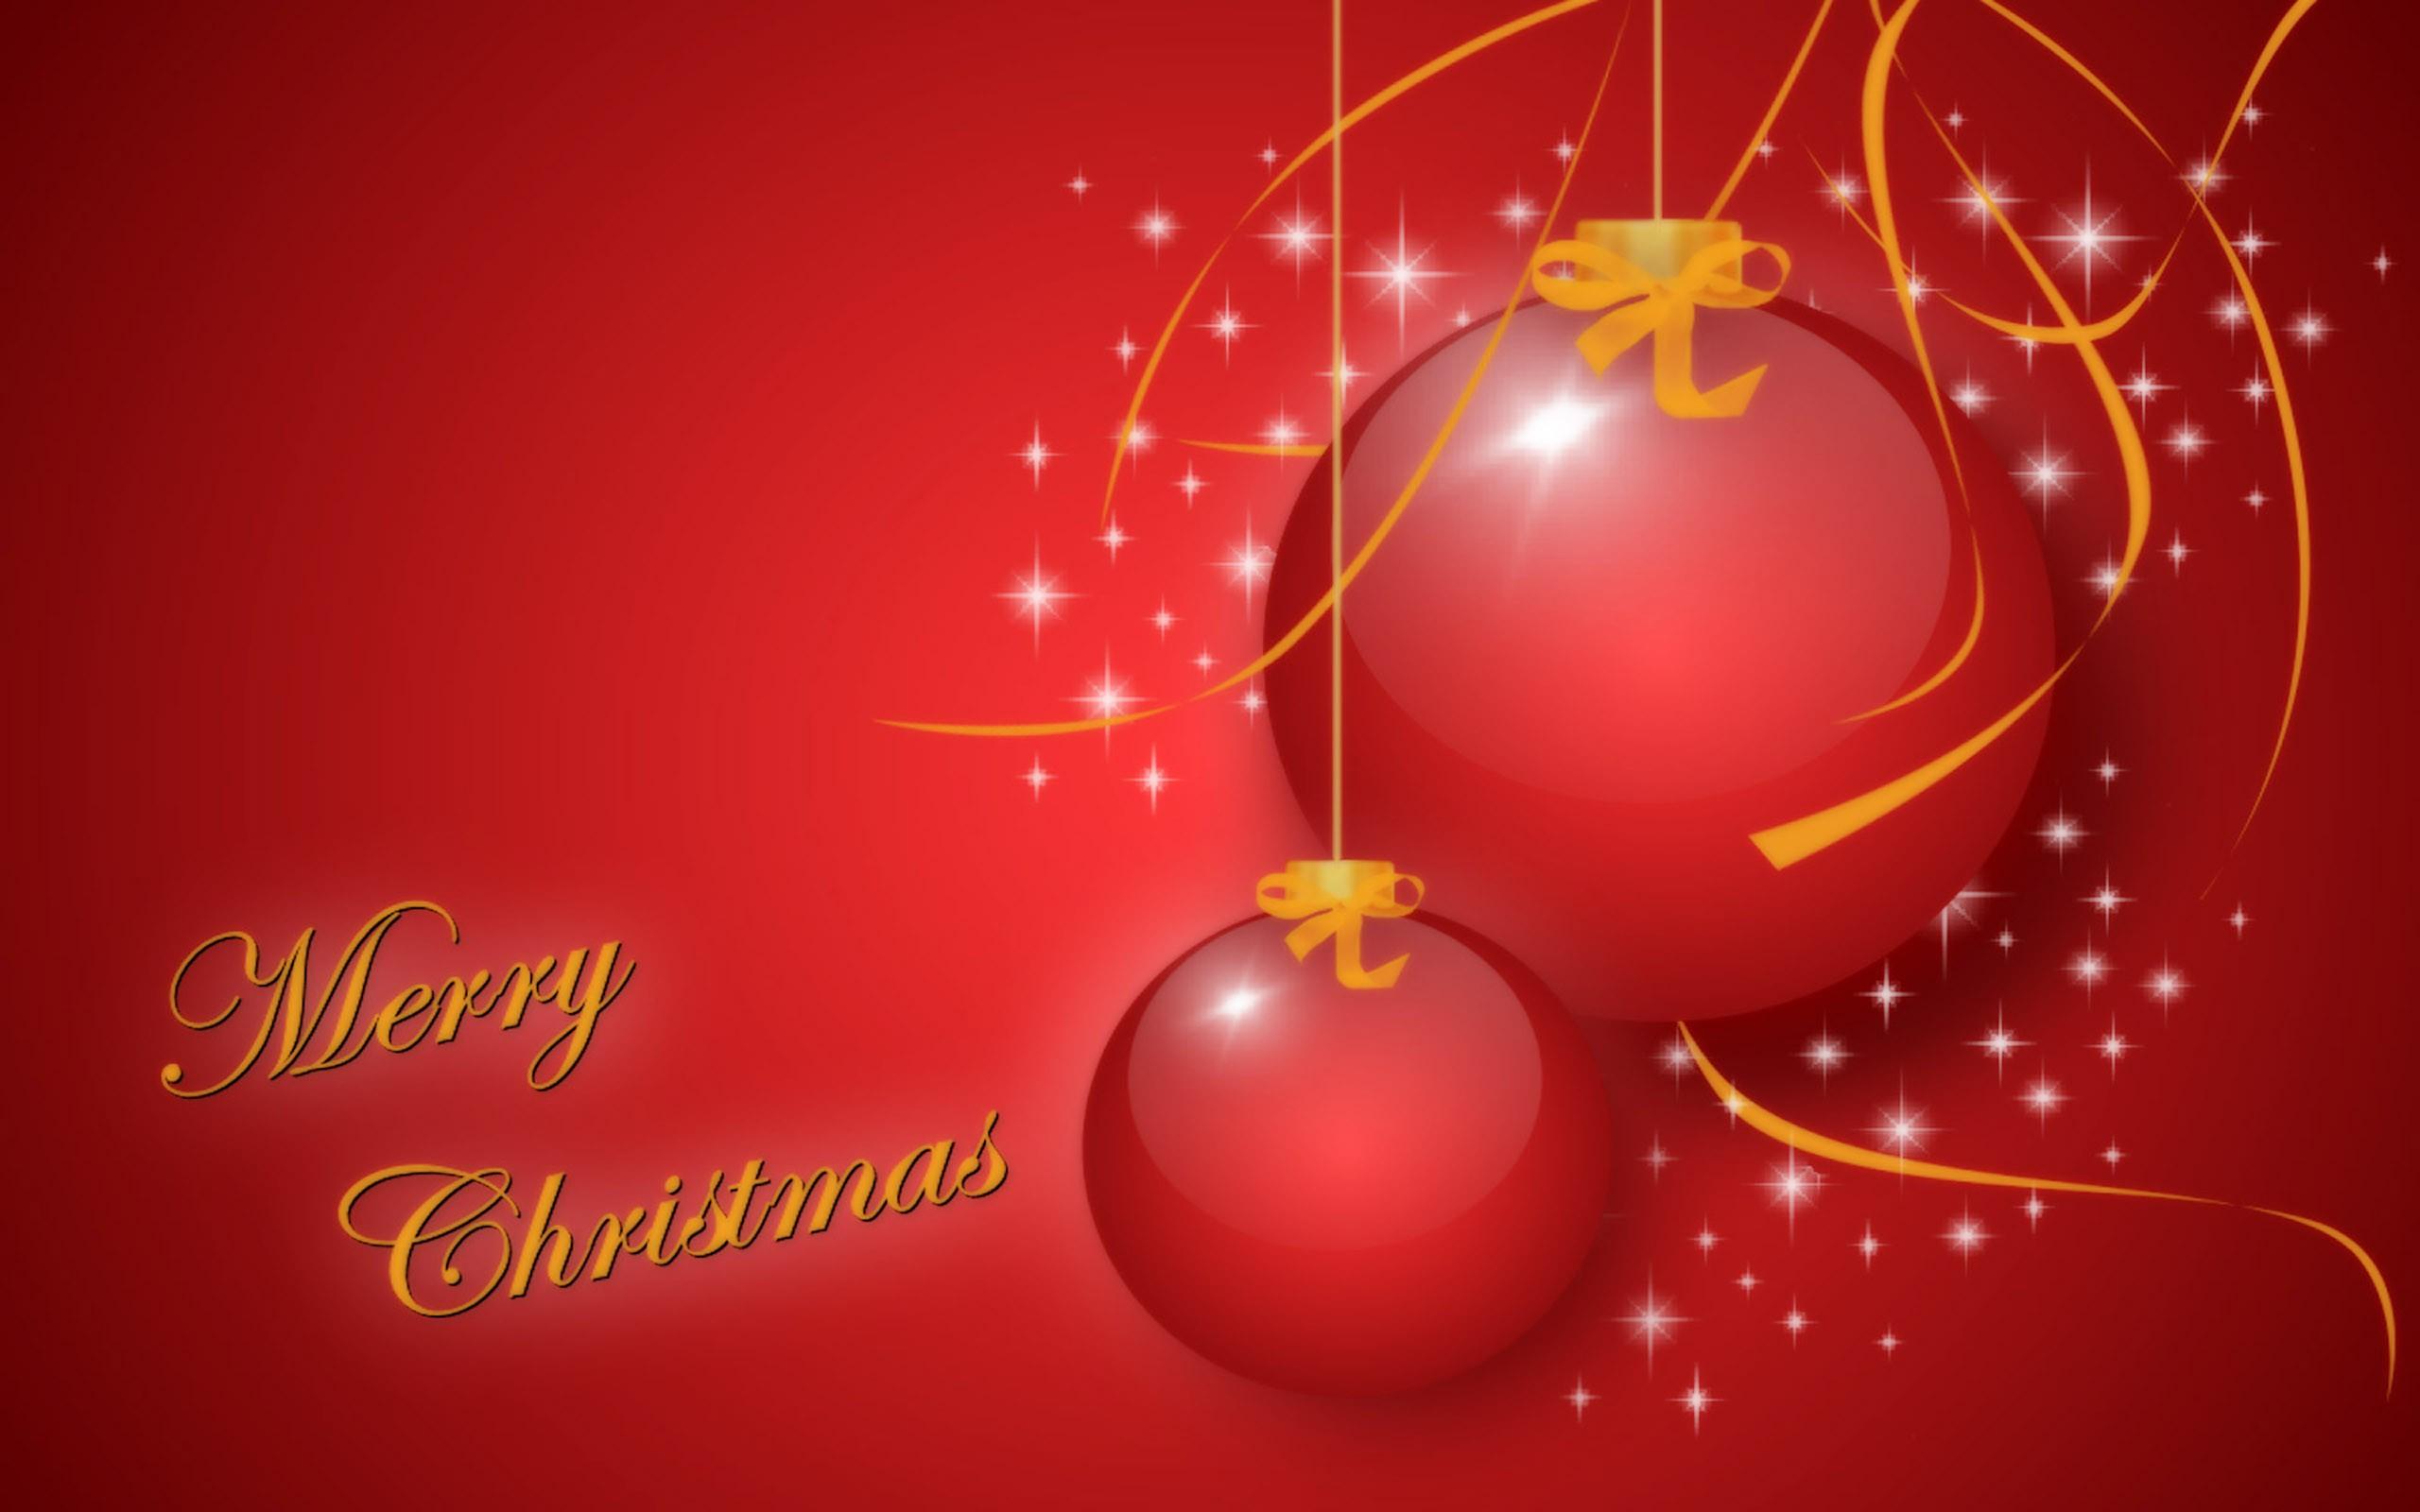 Merry Christmas Обои На Телефон